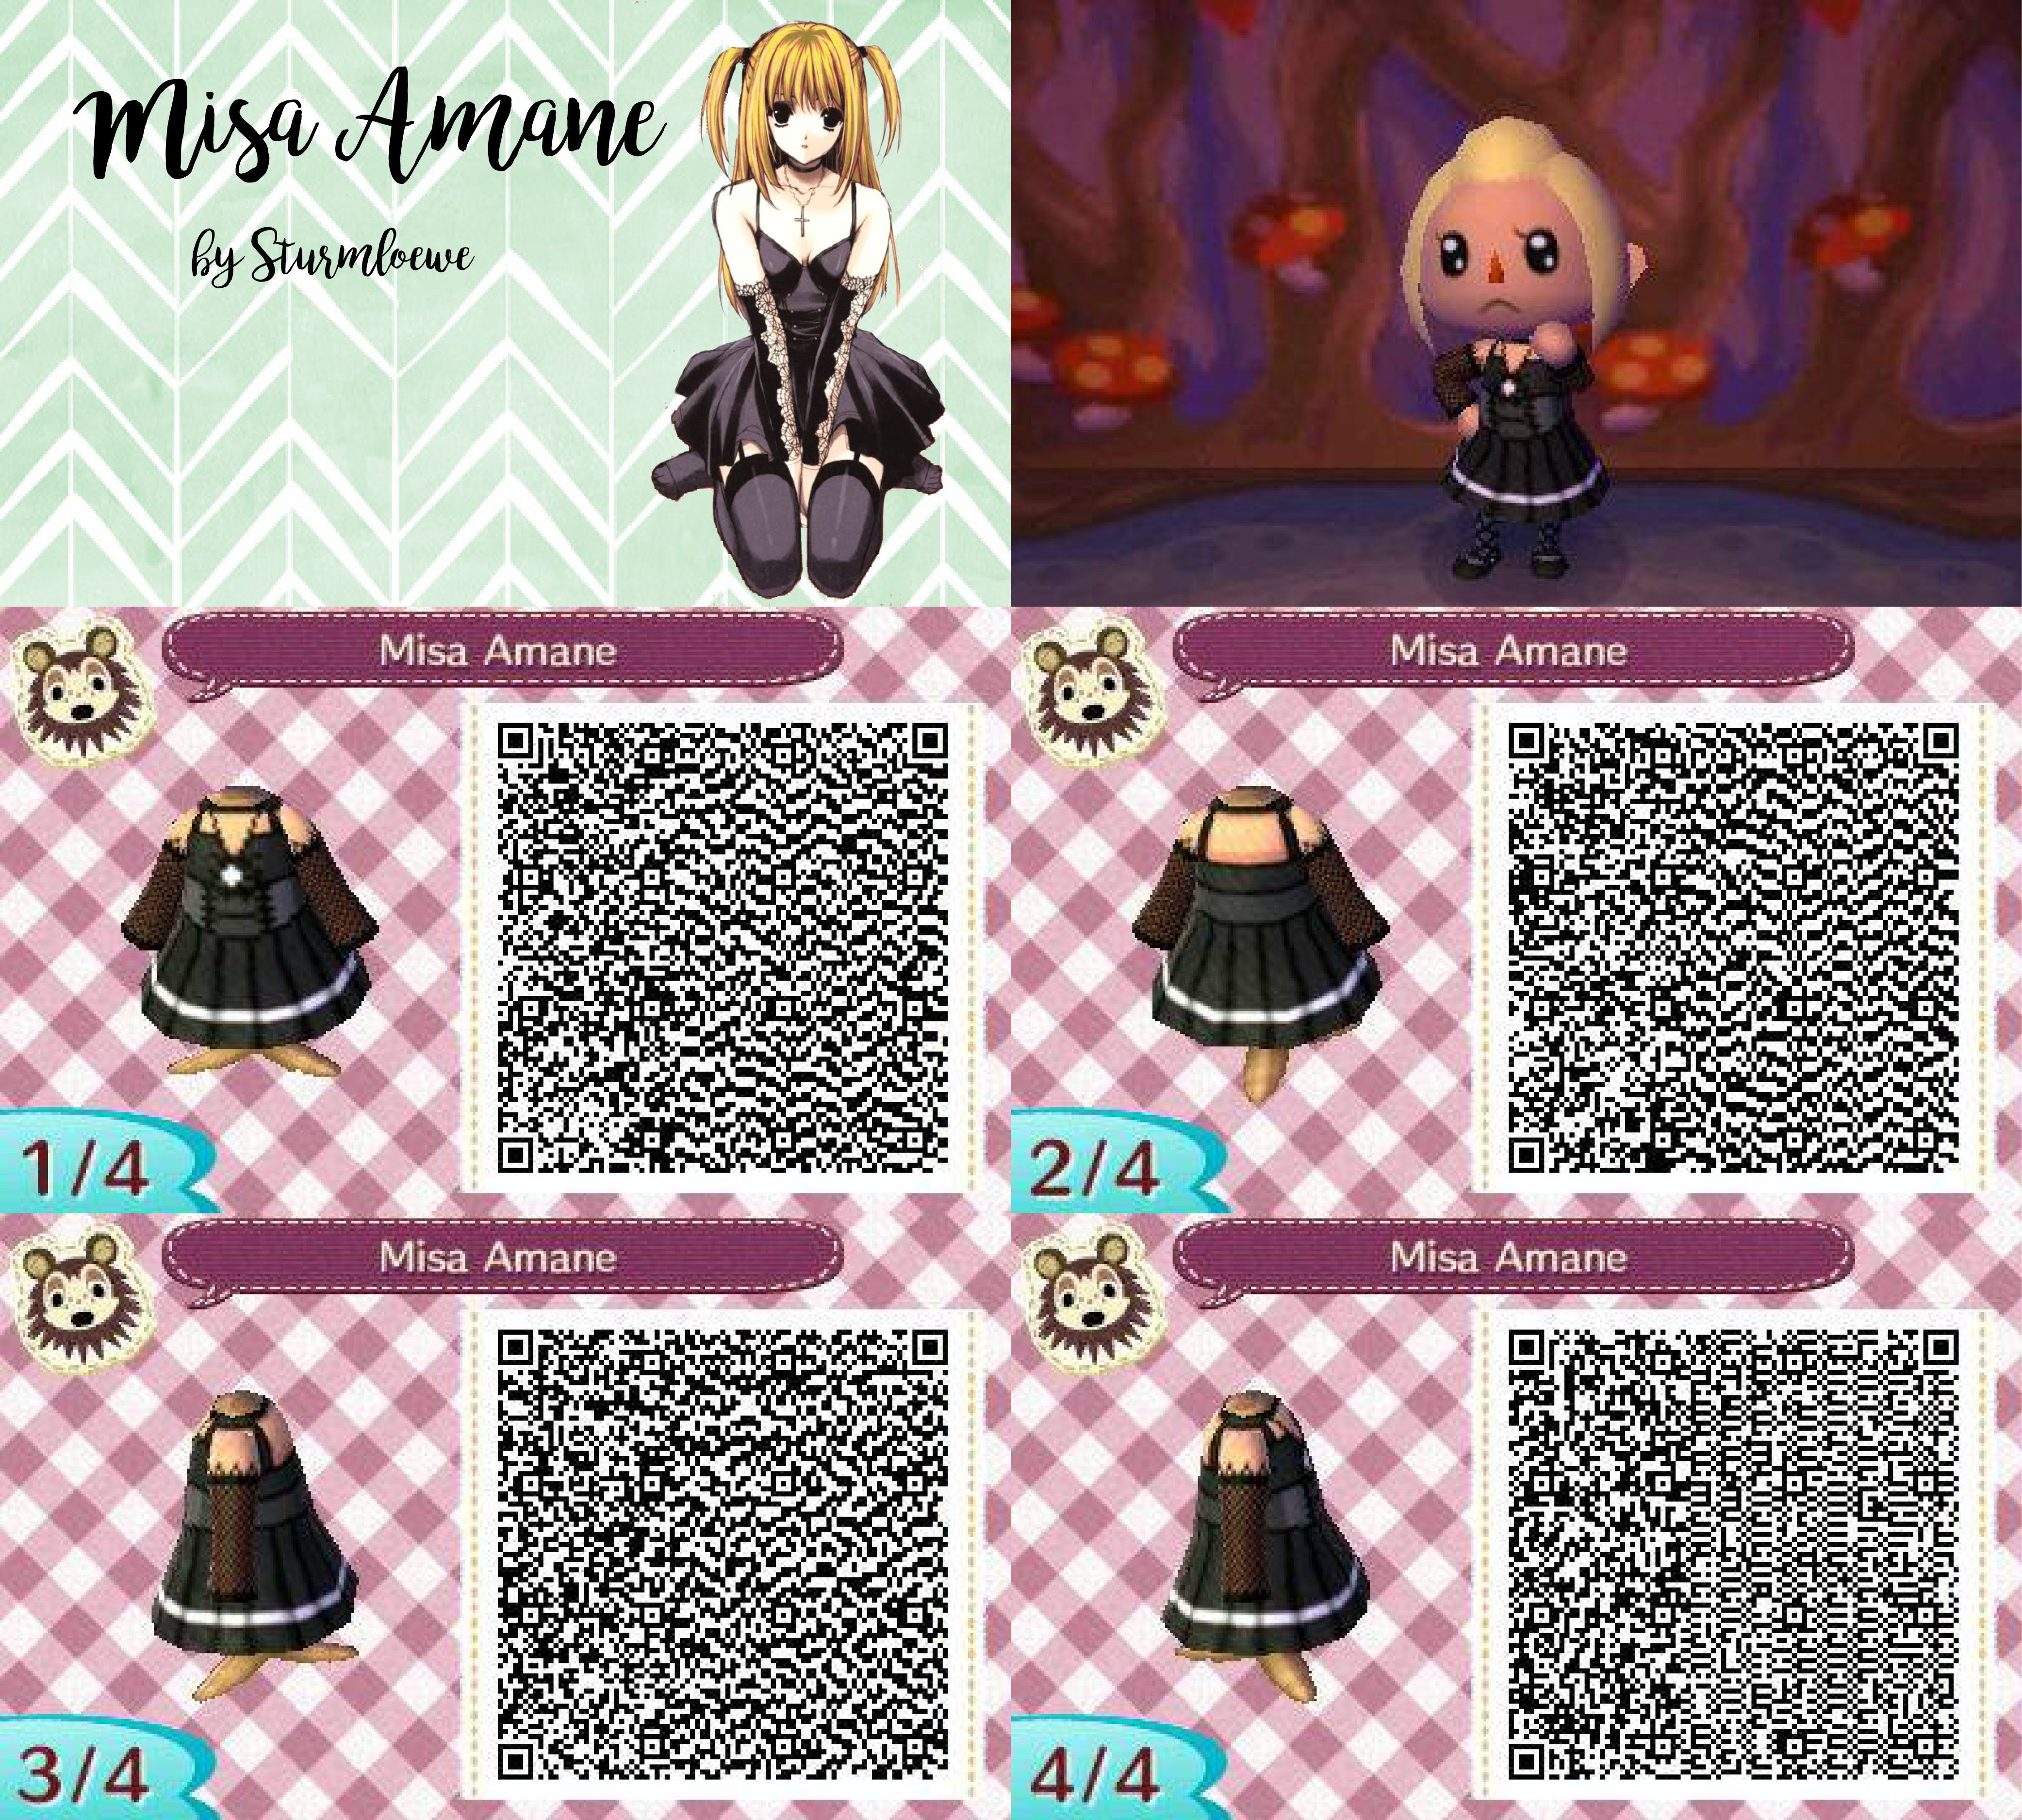 note misa amane dress for animal crossing acnl  qr code girl black goth by sturmloewe